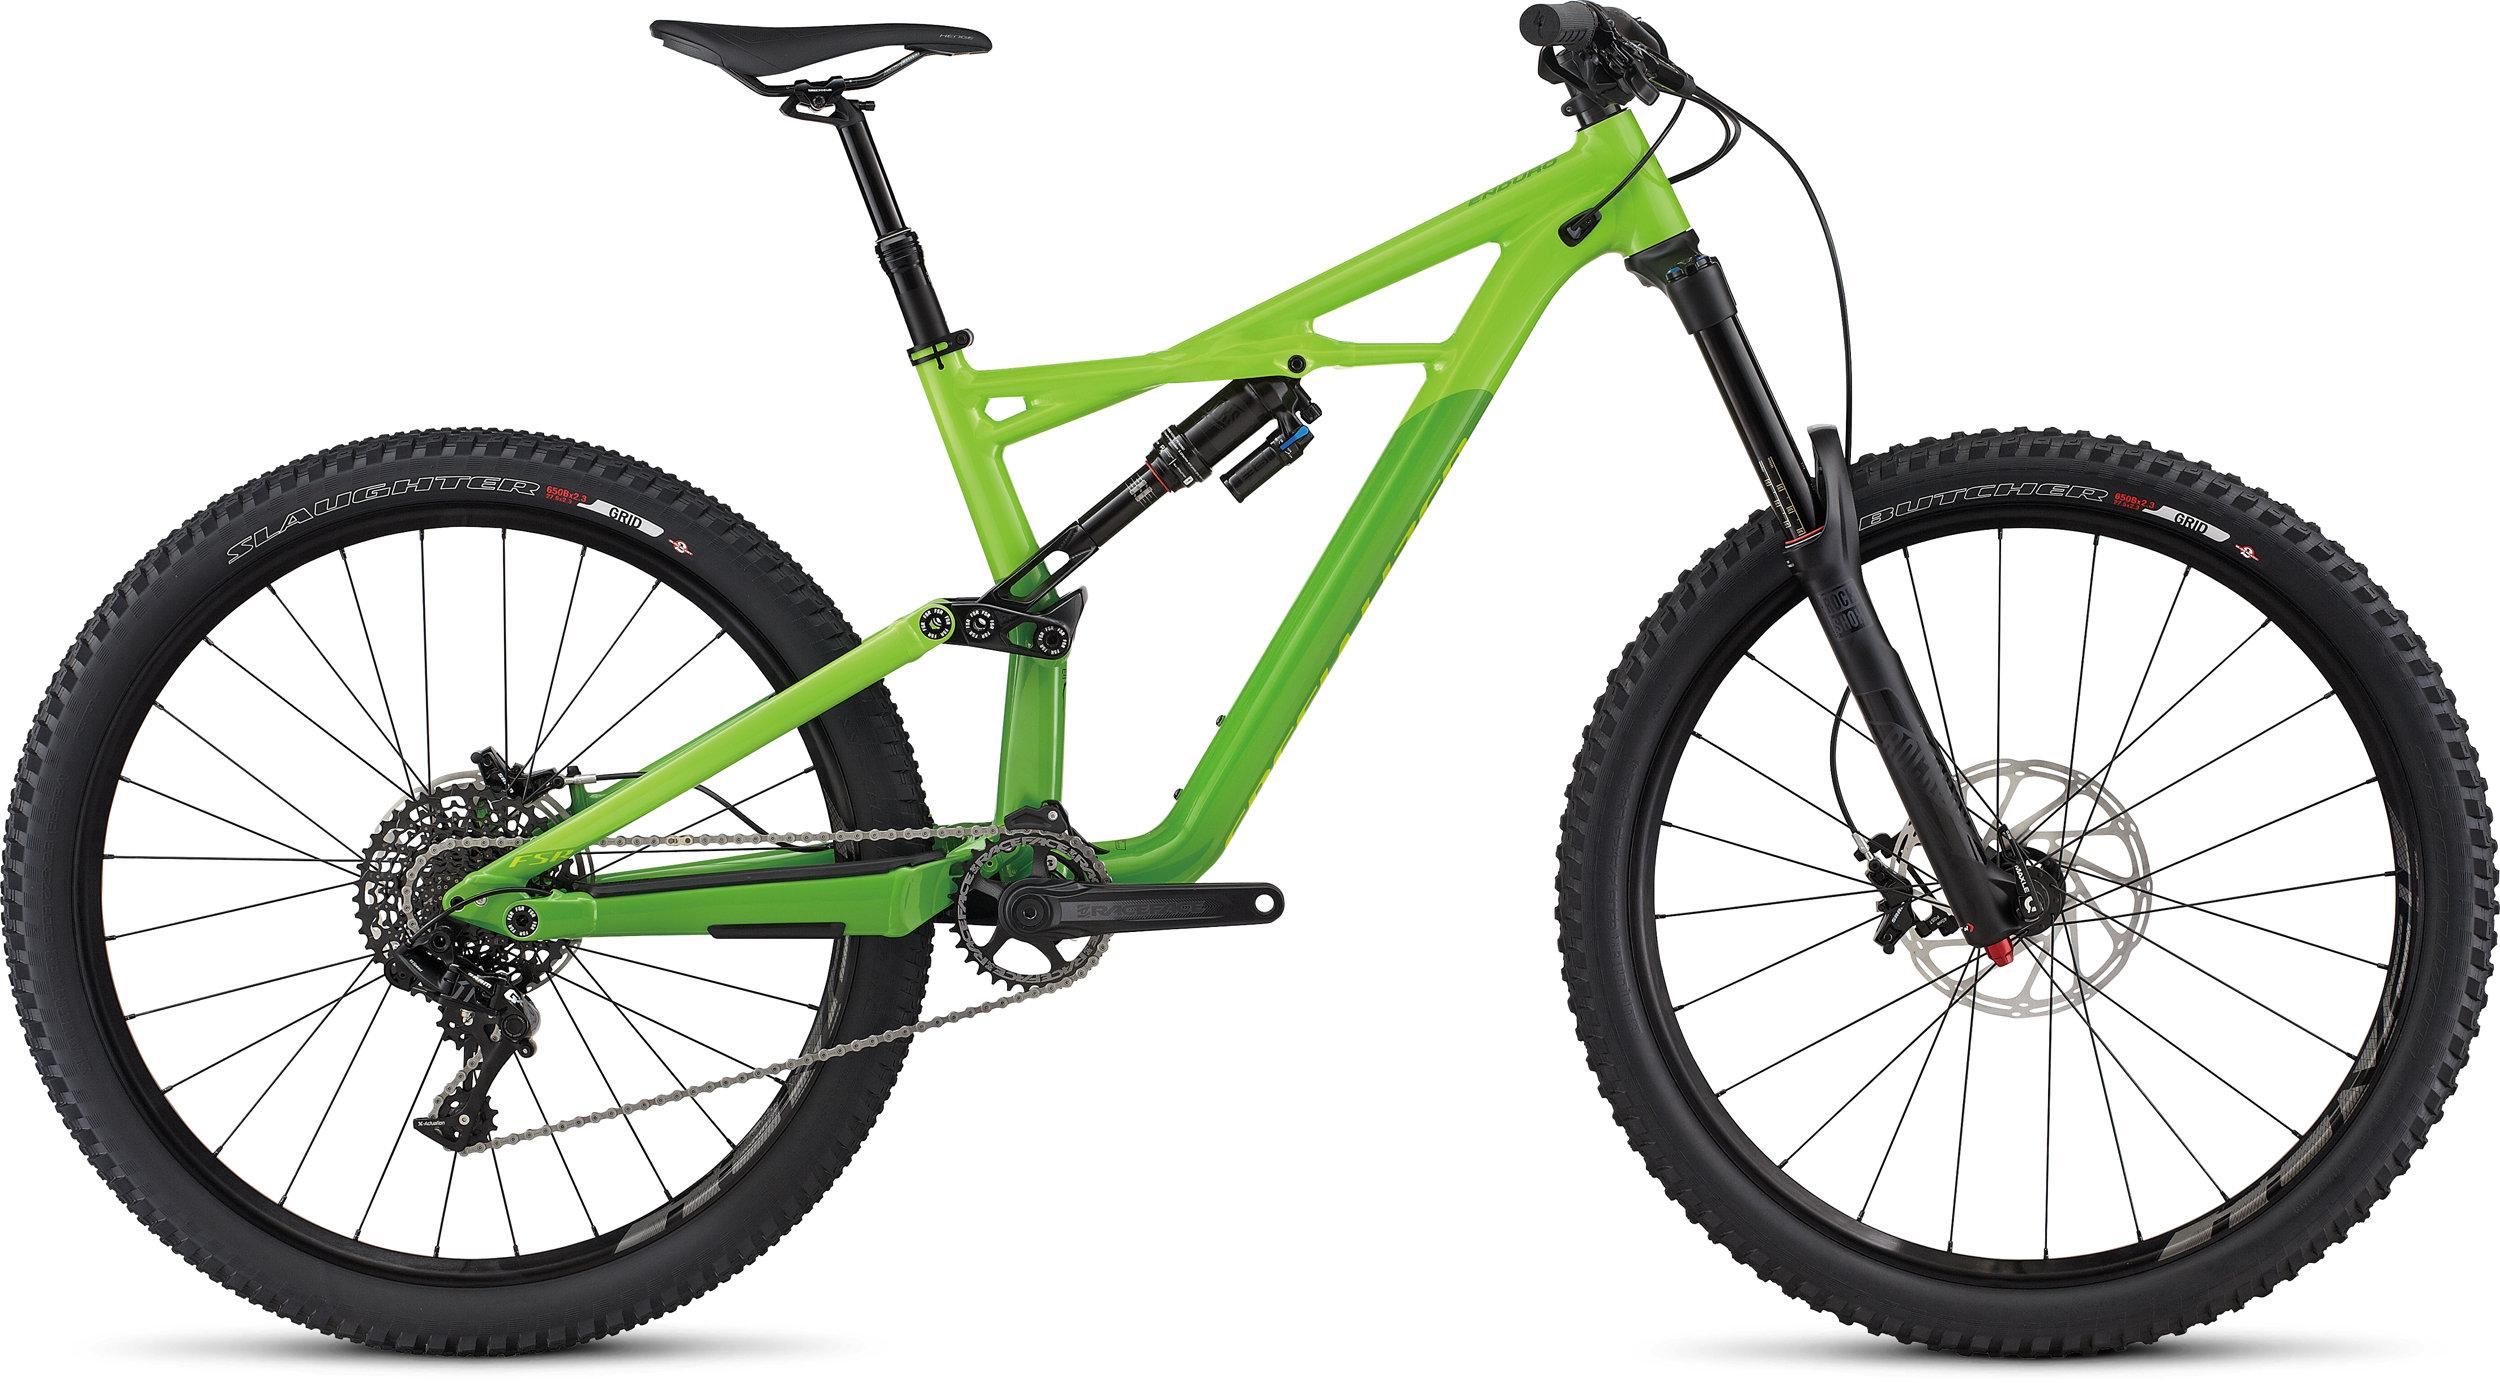 SPECIALIZED ENDURO FSR COMP 650B MXGRN/MONGRN/HYP L - Pulsschlag Bike+Sport